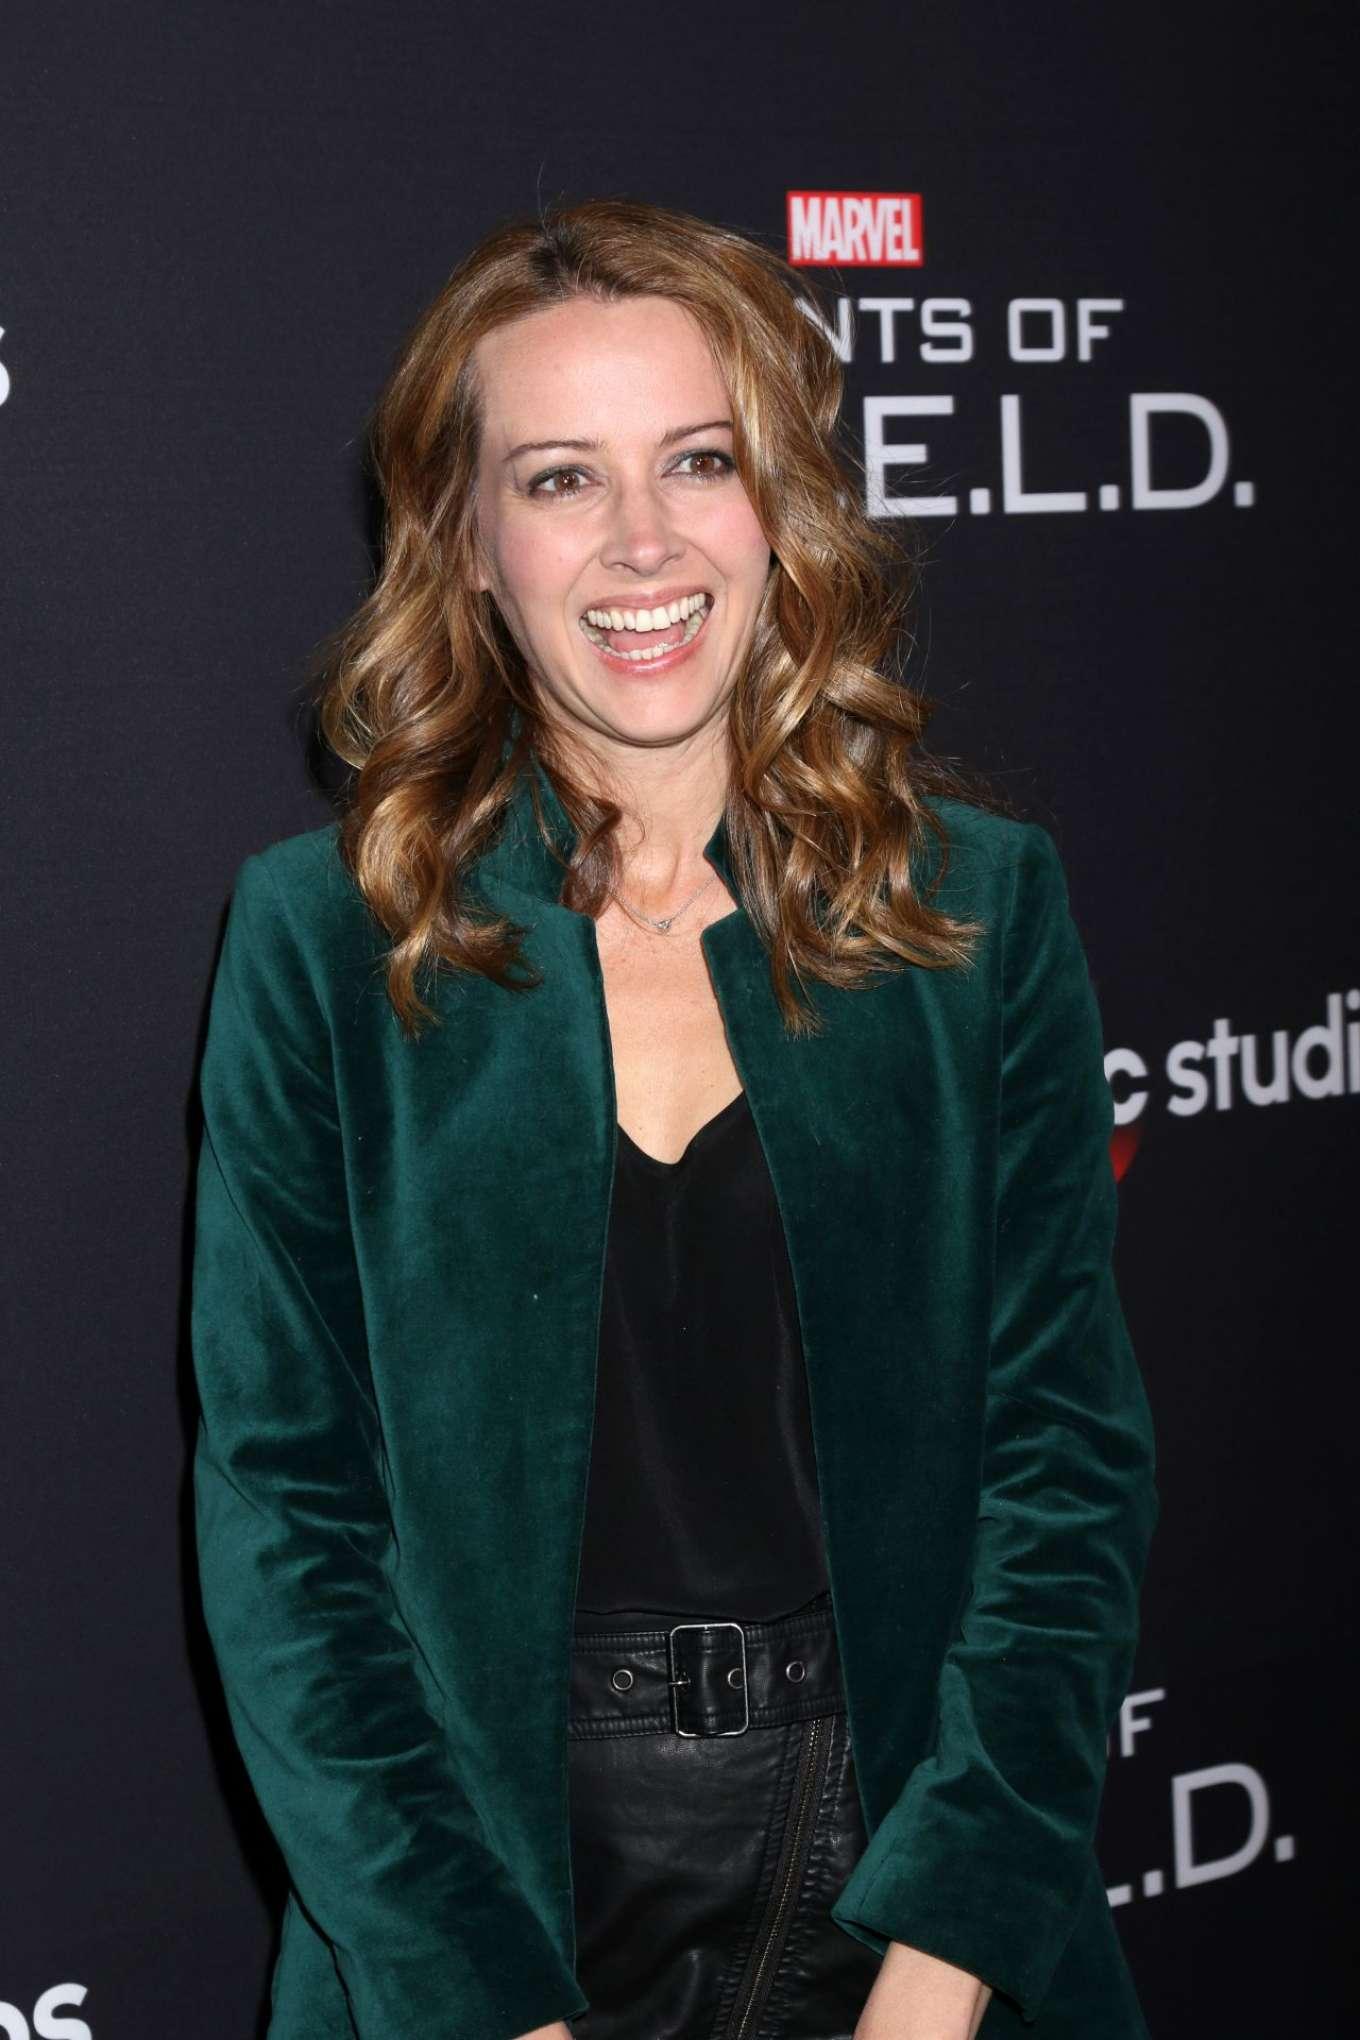 Amy Acker - 'Marvel's Agents of S.H.I.E.L.D.' 100th episode celebration in Hollywood